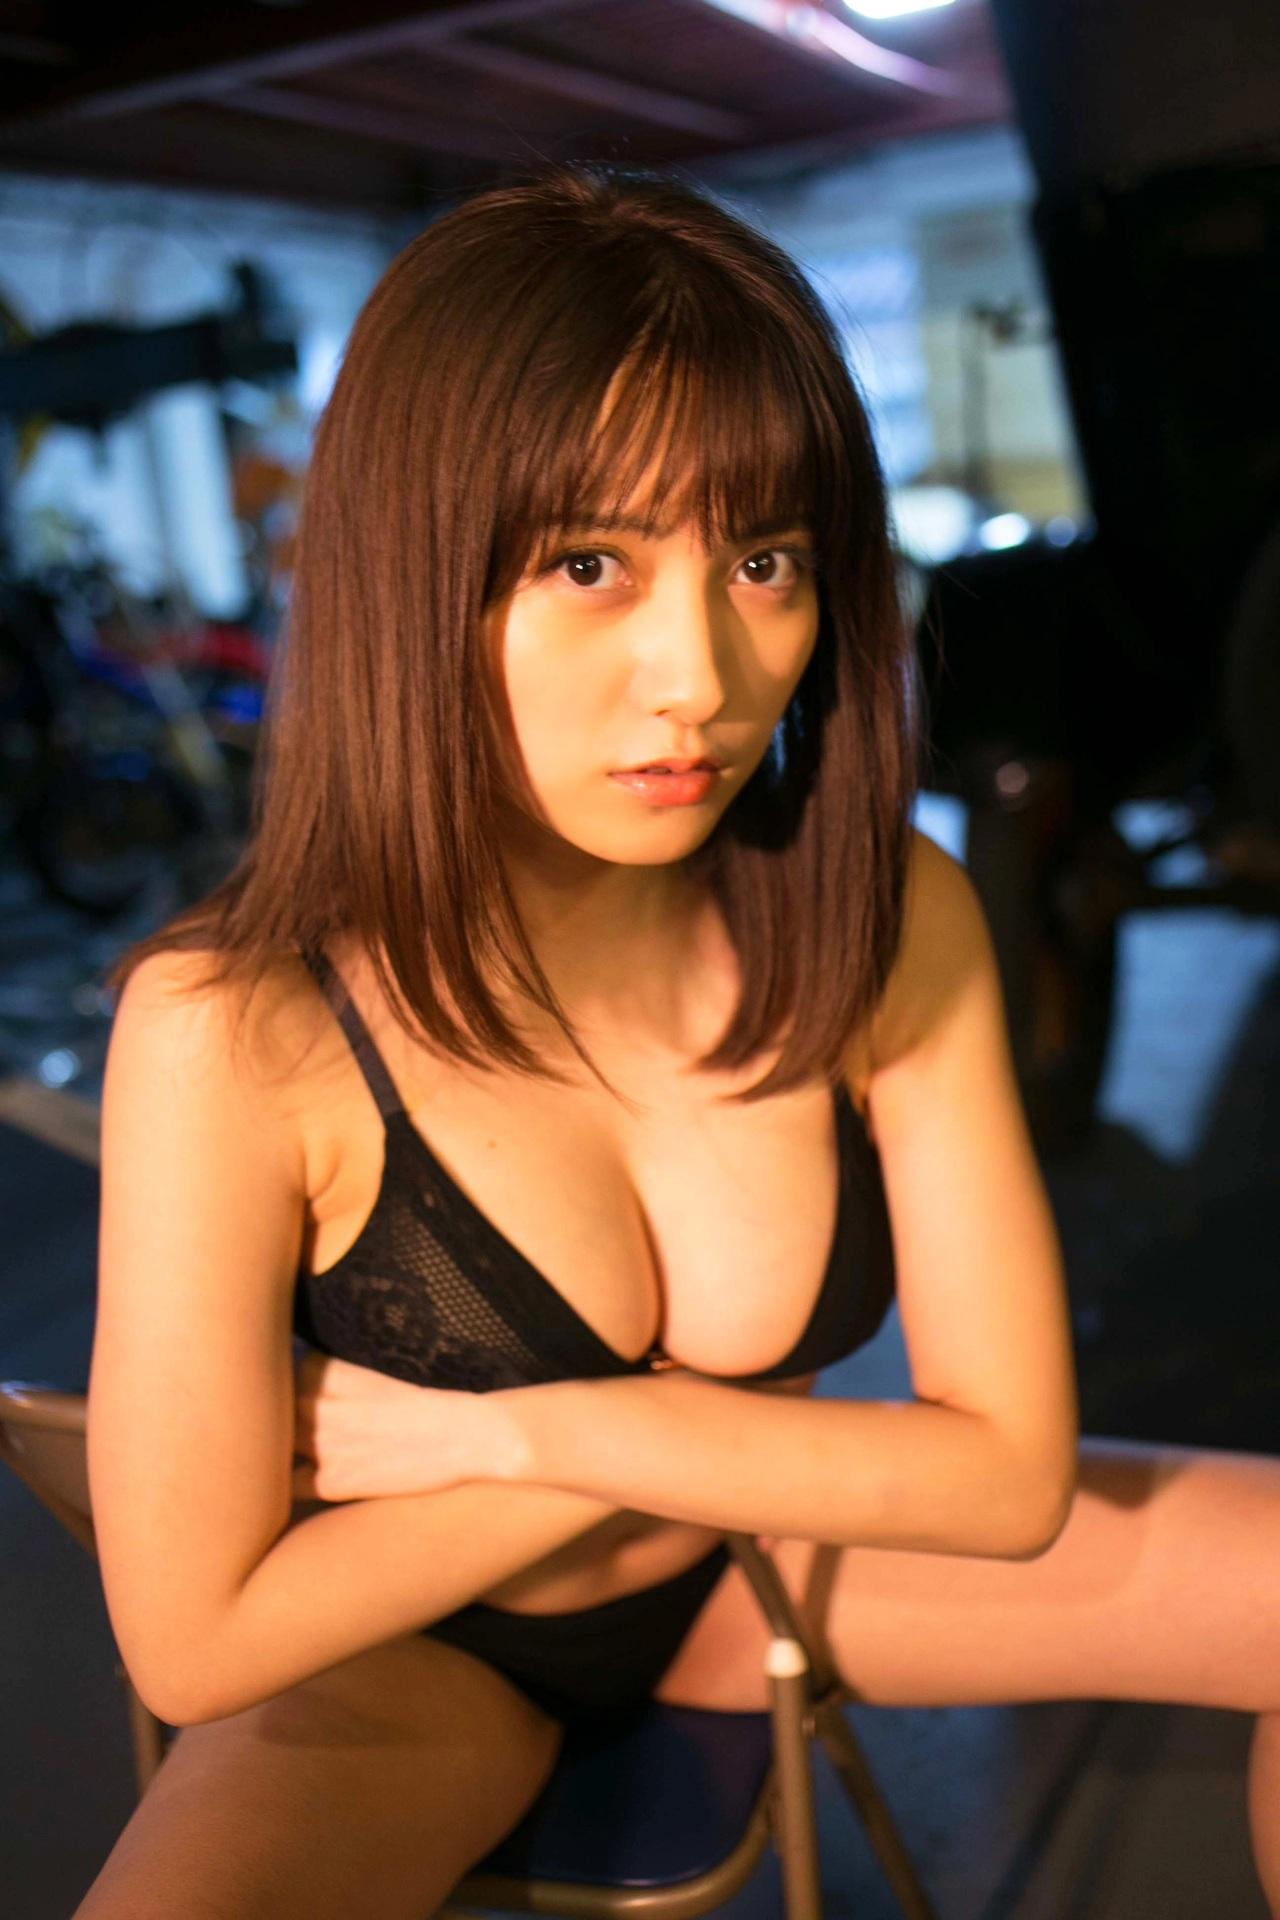 NMomotsuki EnTame 2105 10.jpg